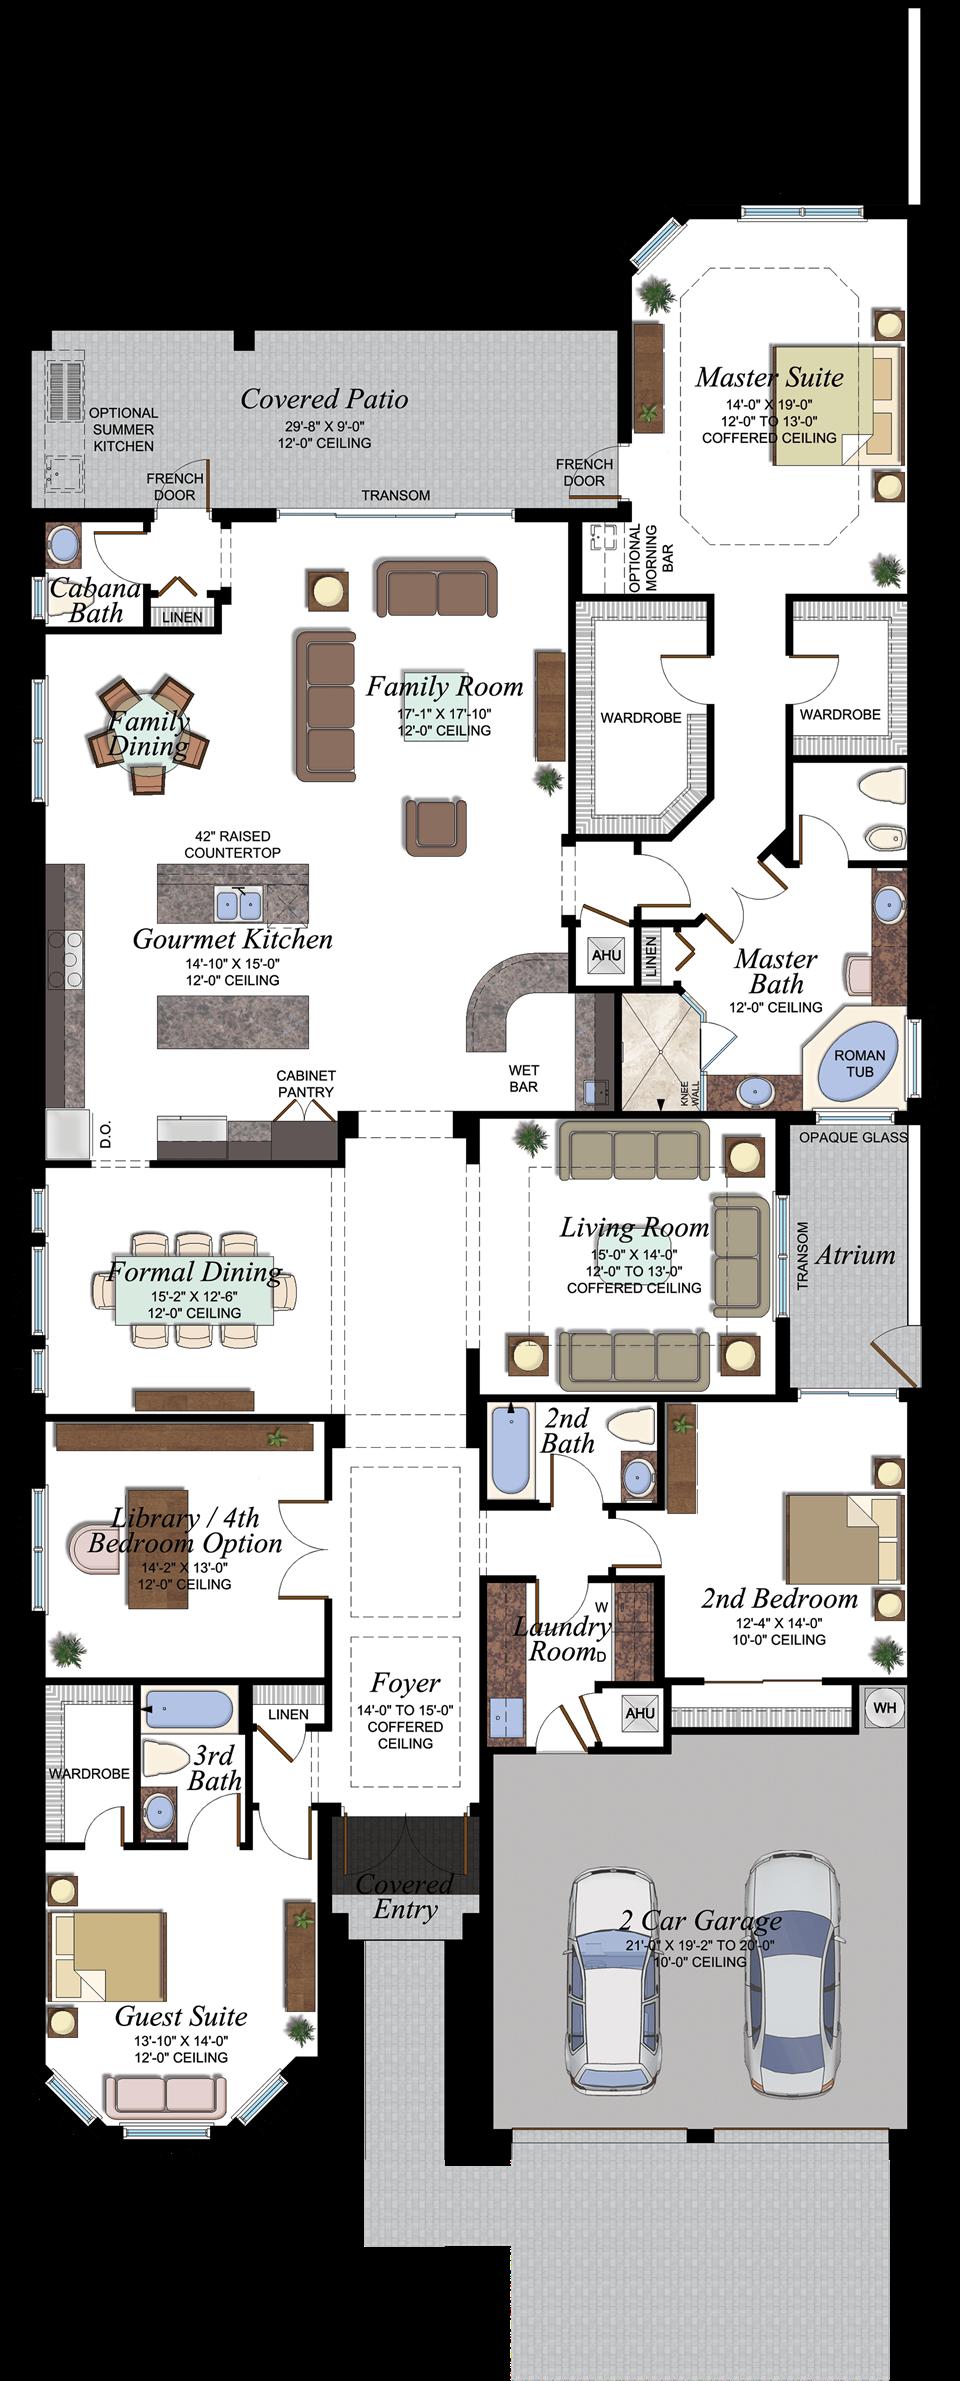 Seven Bridges Paseo Floorplan House Plans Florida Real Estate Floor Plans